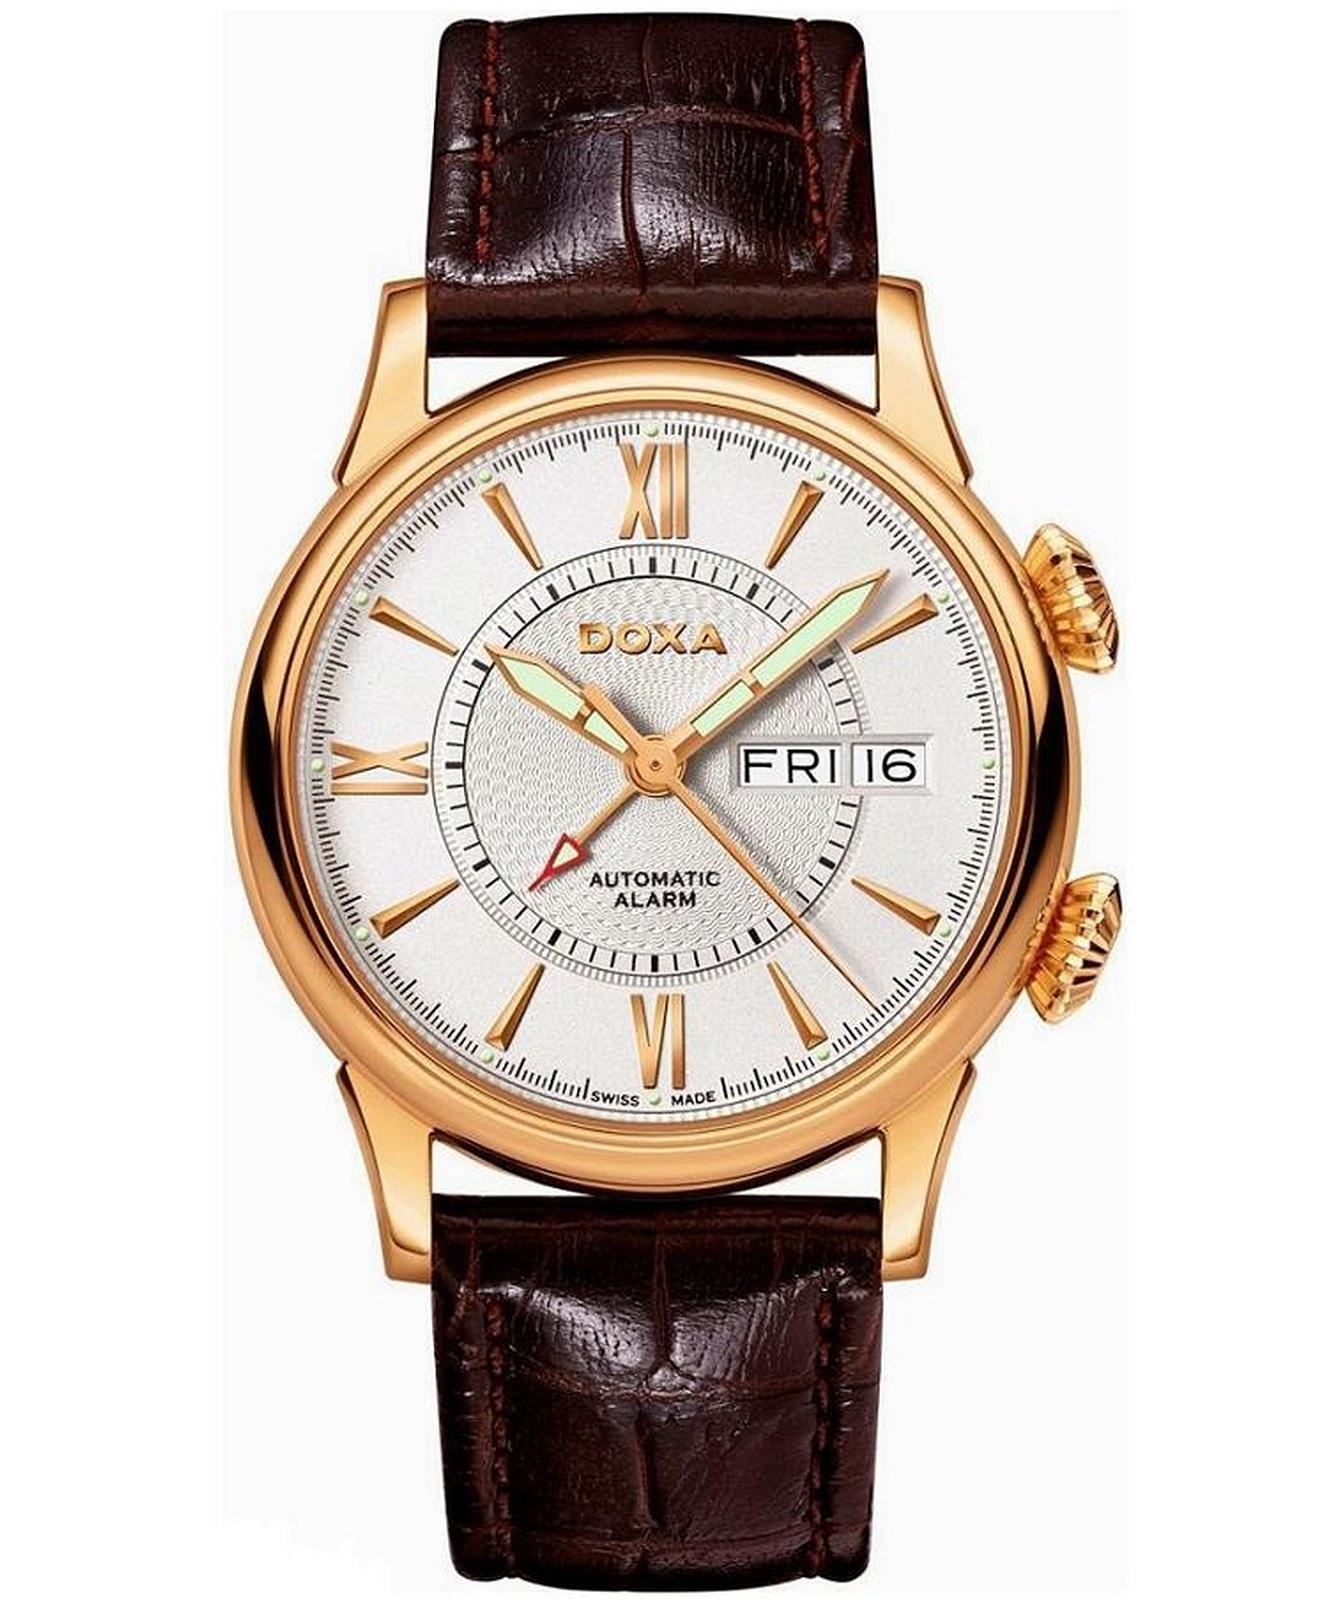 zegarek-meski-doxa-vintage-fusion-alarm-automatic-limited-edition-625-90-022-02